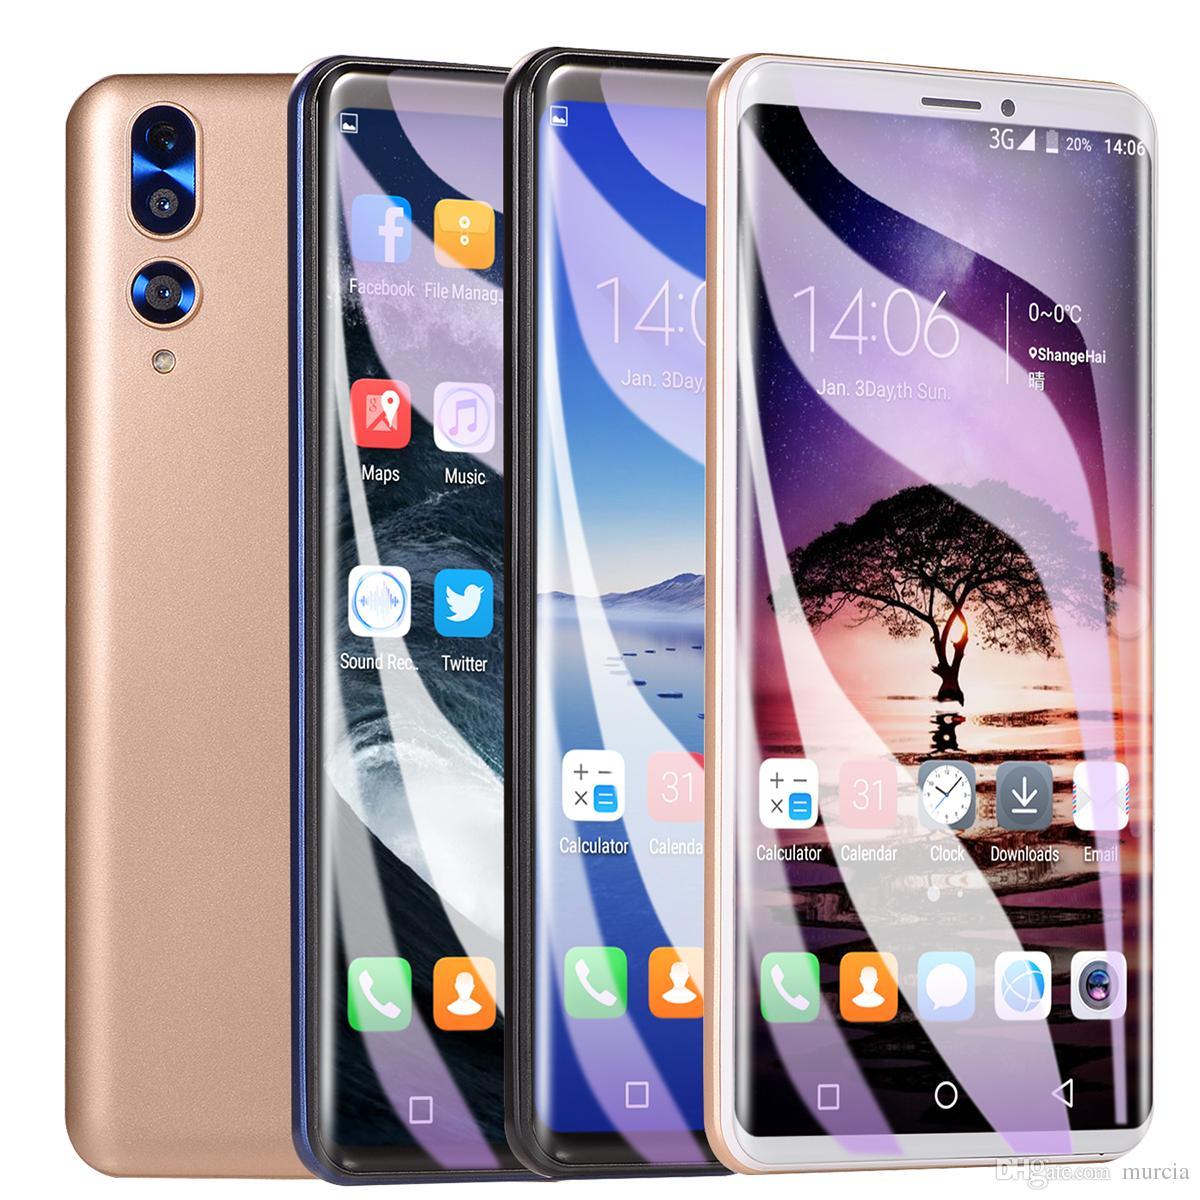 5.72 Inch P20 Mtk6580 Четырехъядерный смартфон 512 МБ Ram 4 ГБ Rom 5MP Камера Мобильный телефон 4 цвета В наличии Wifi Показ 4 ГБ оперативной памяти 32 ГБ Rom Hot